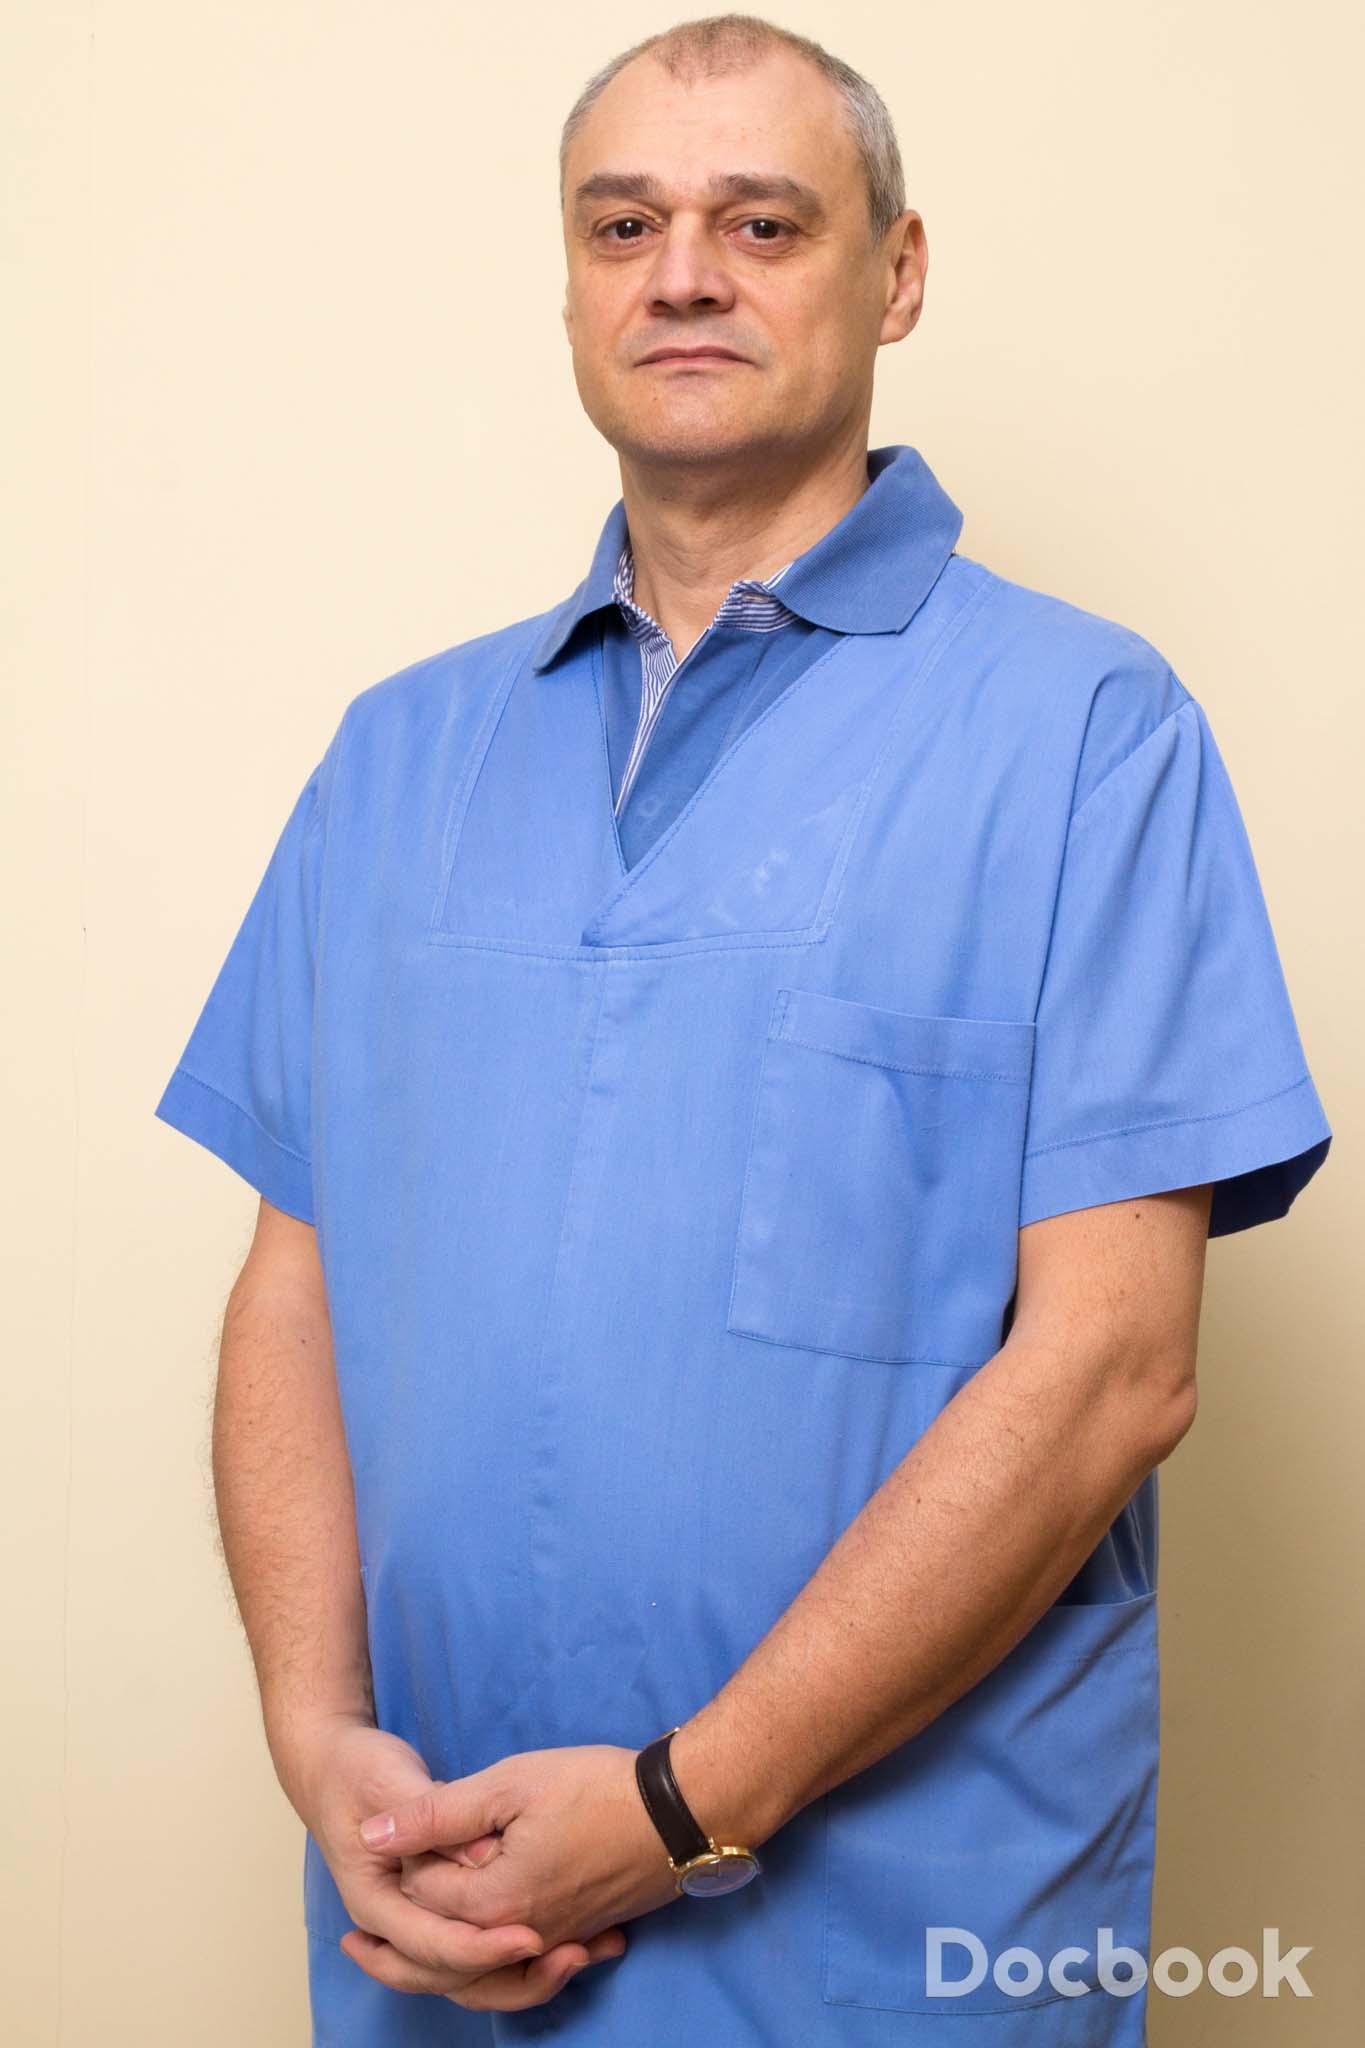 Dr. Manuc Mircea